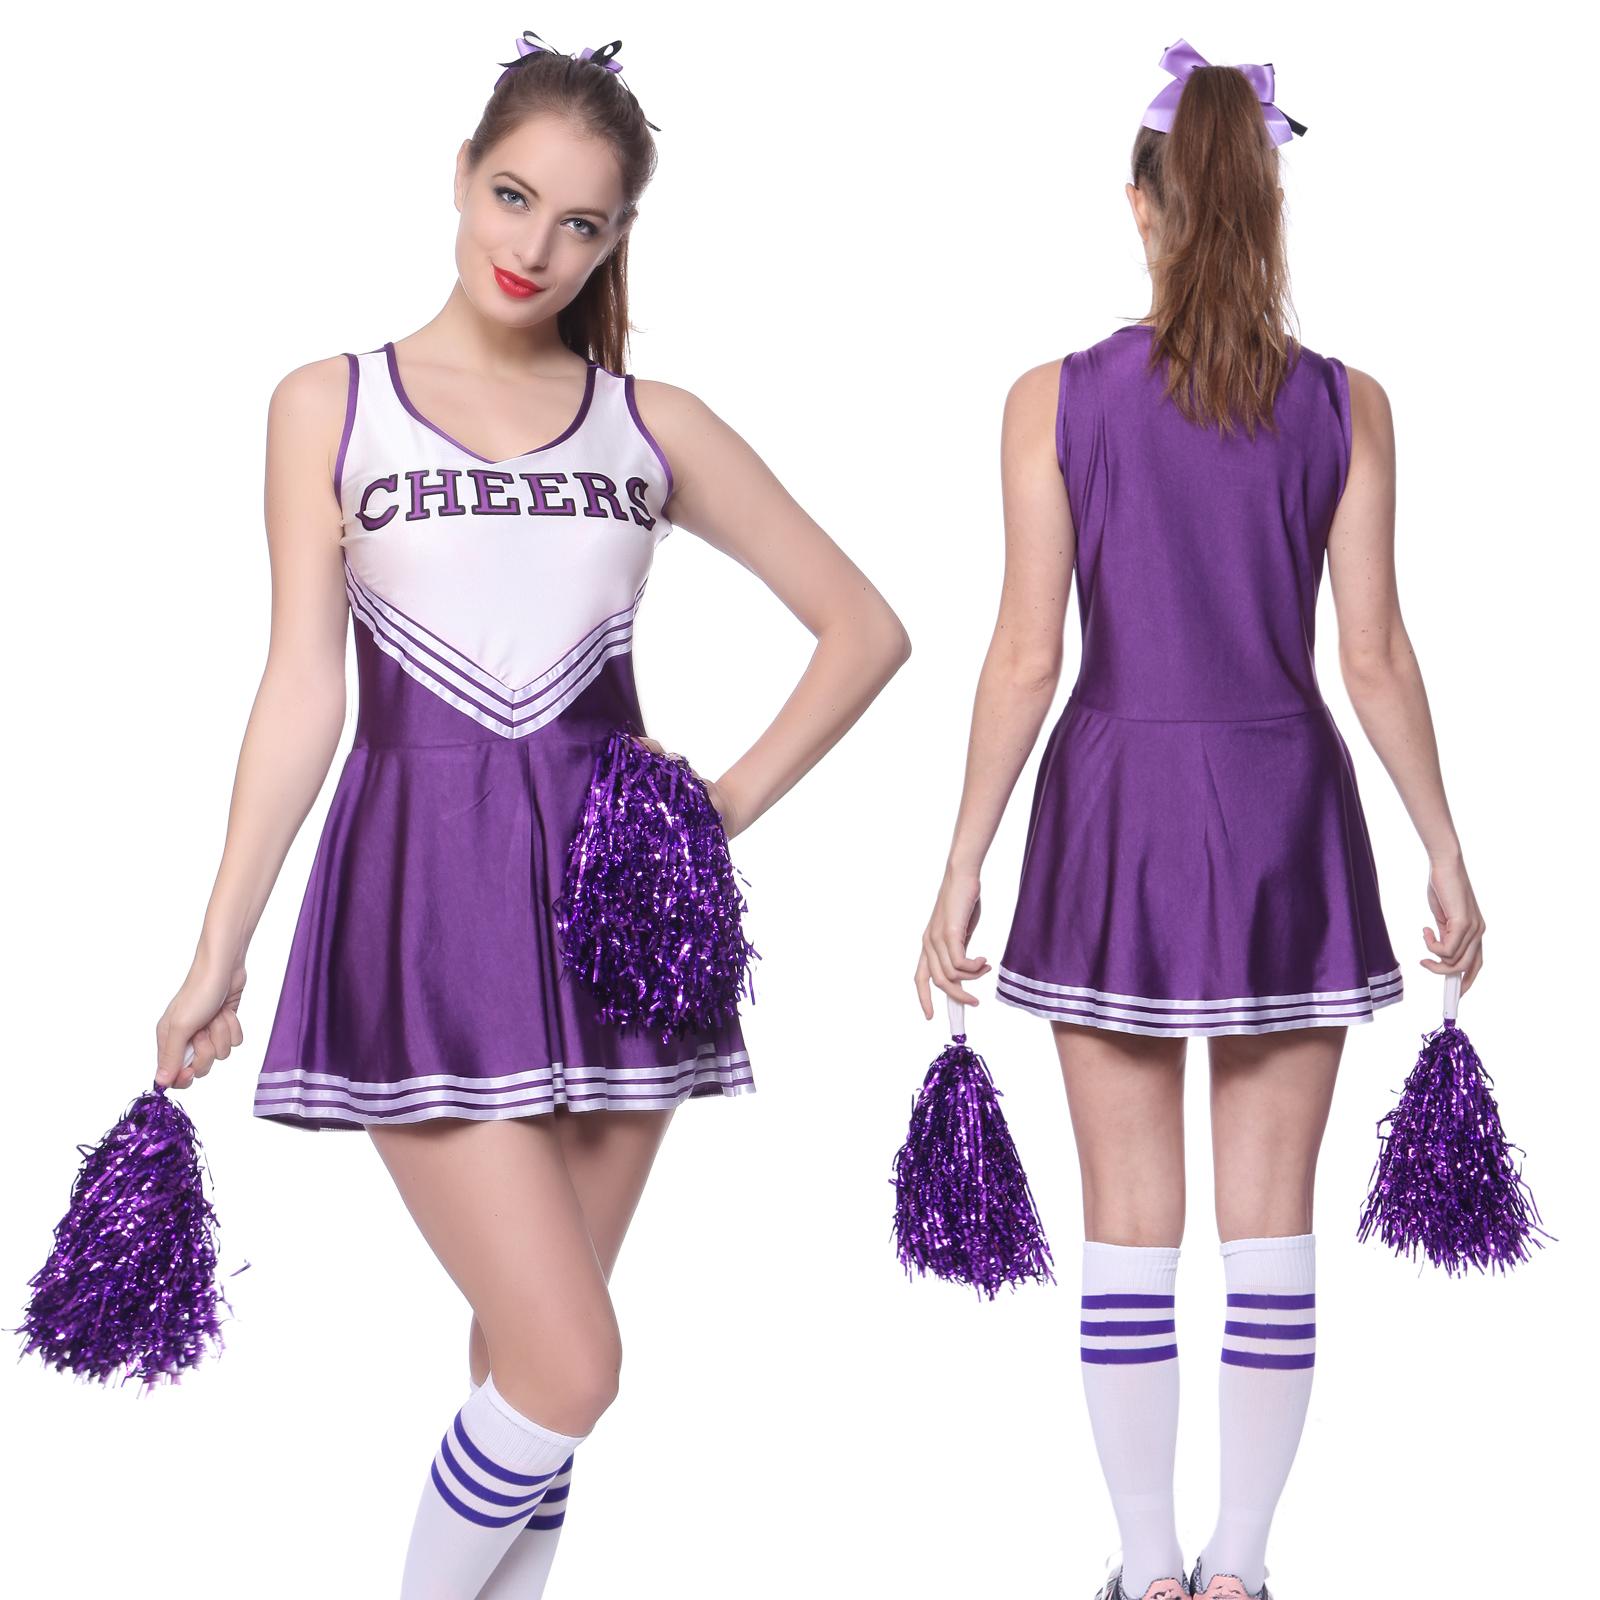 Robe-Debardeur-Deguisement-PomPom-Girl-Uniforme-Cheerleader-XS-XL-Oversize-Femme